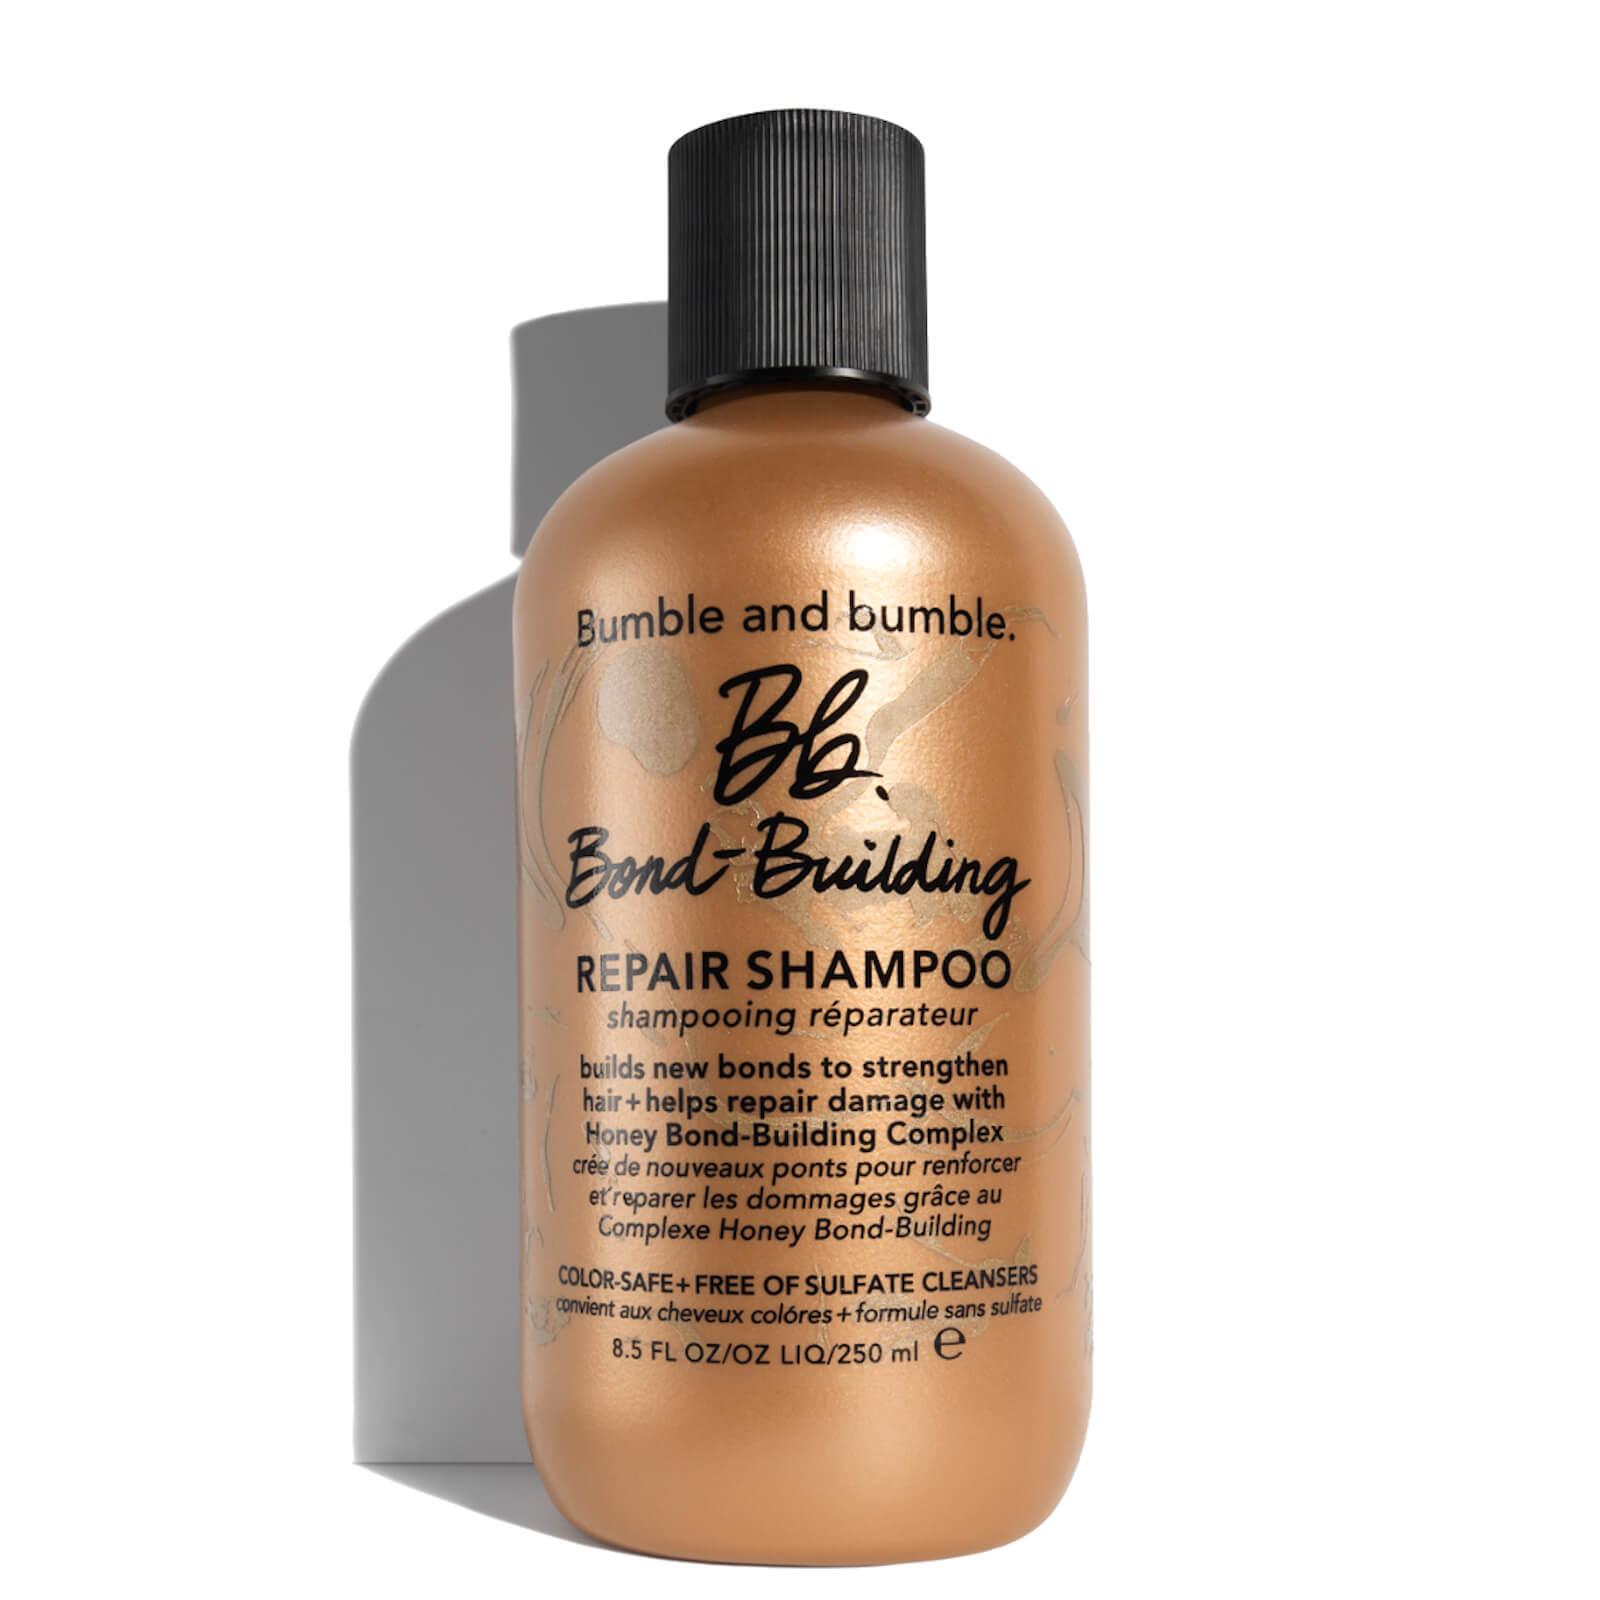 Bumble and bumble Bond-Building Repair Shampoo 250ml